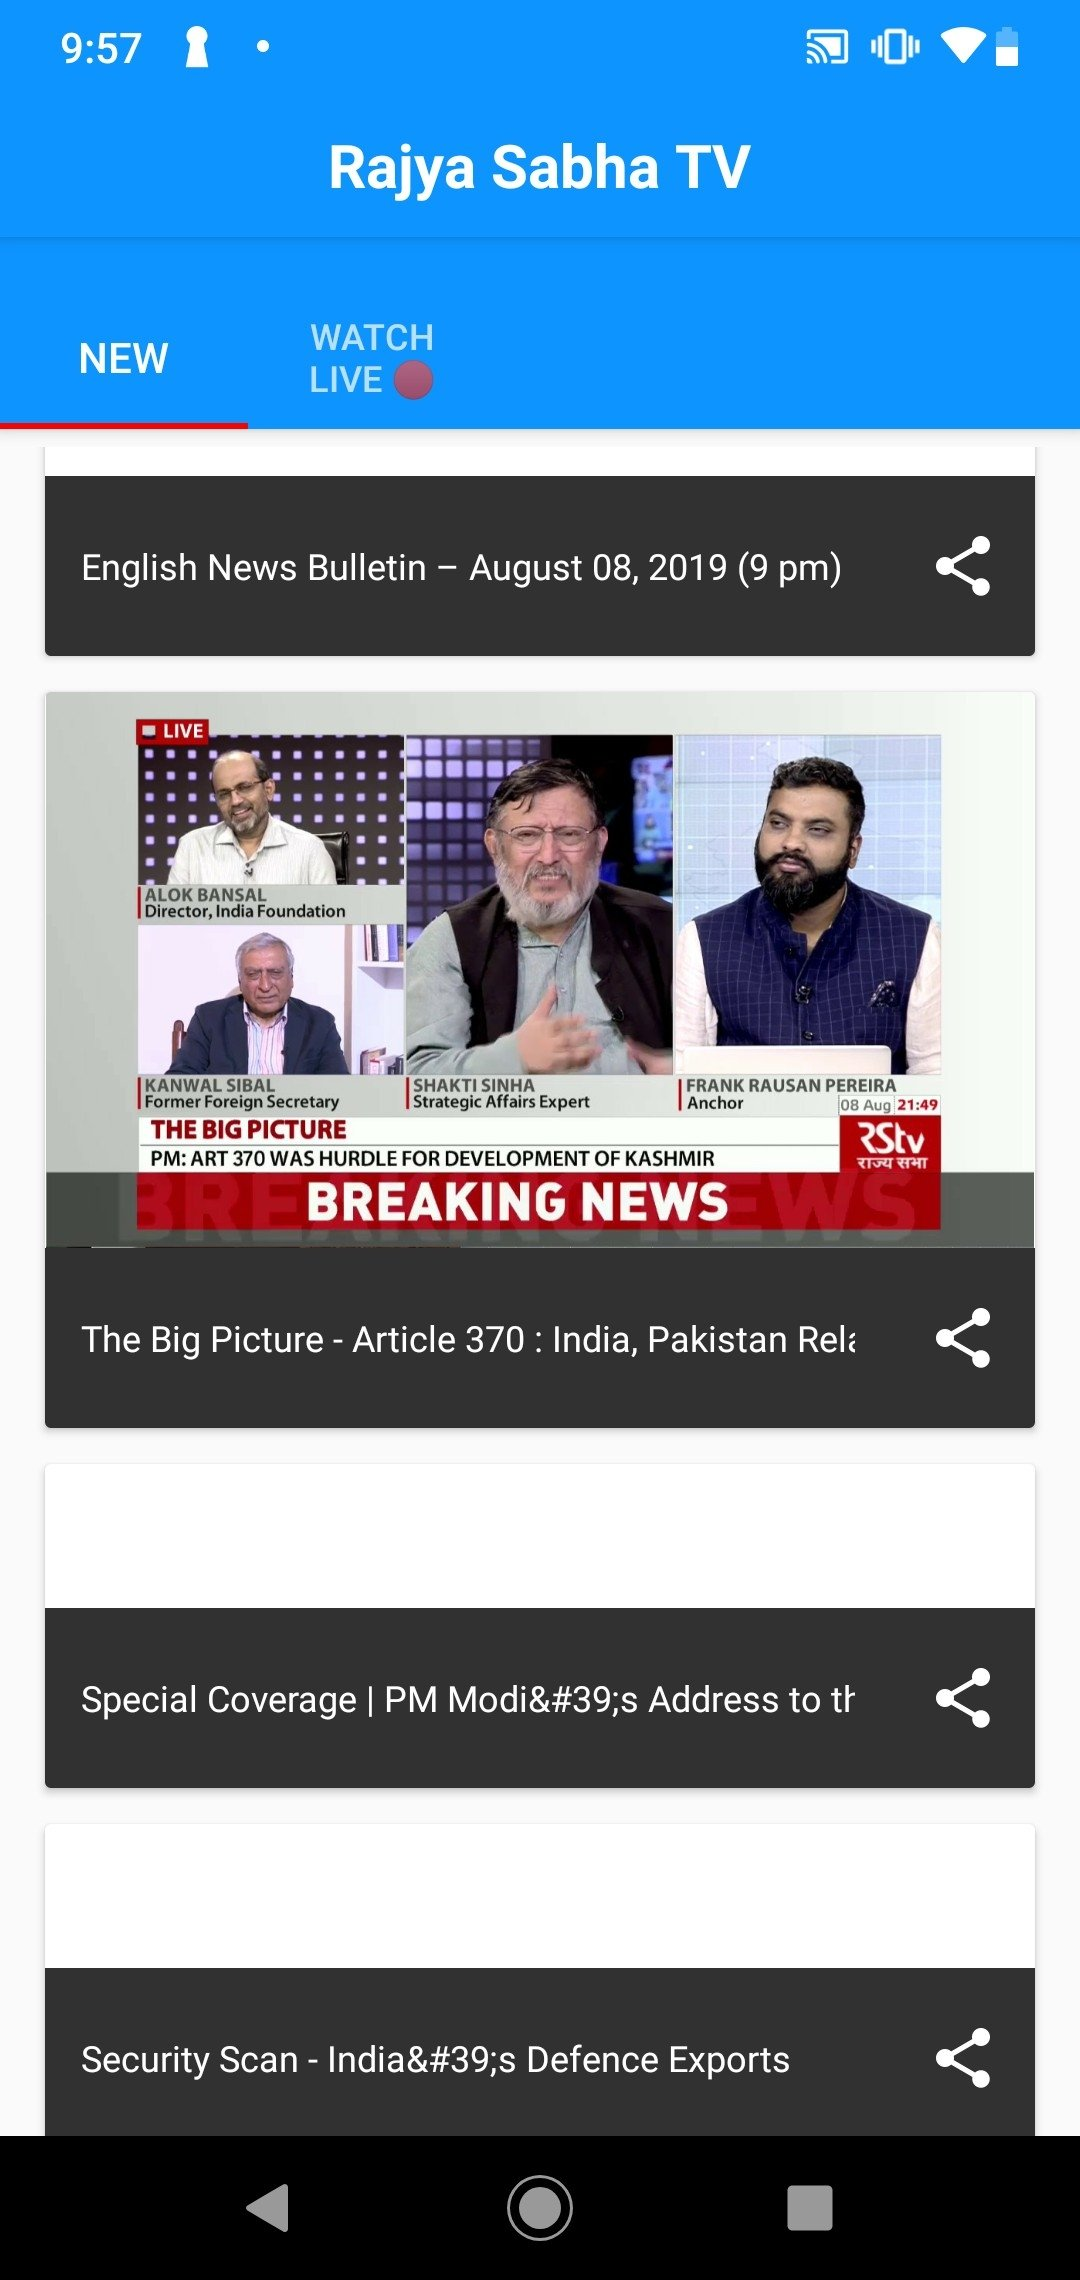 Rajya Sabha TV 1 0 - Download for Android APK Free